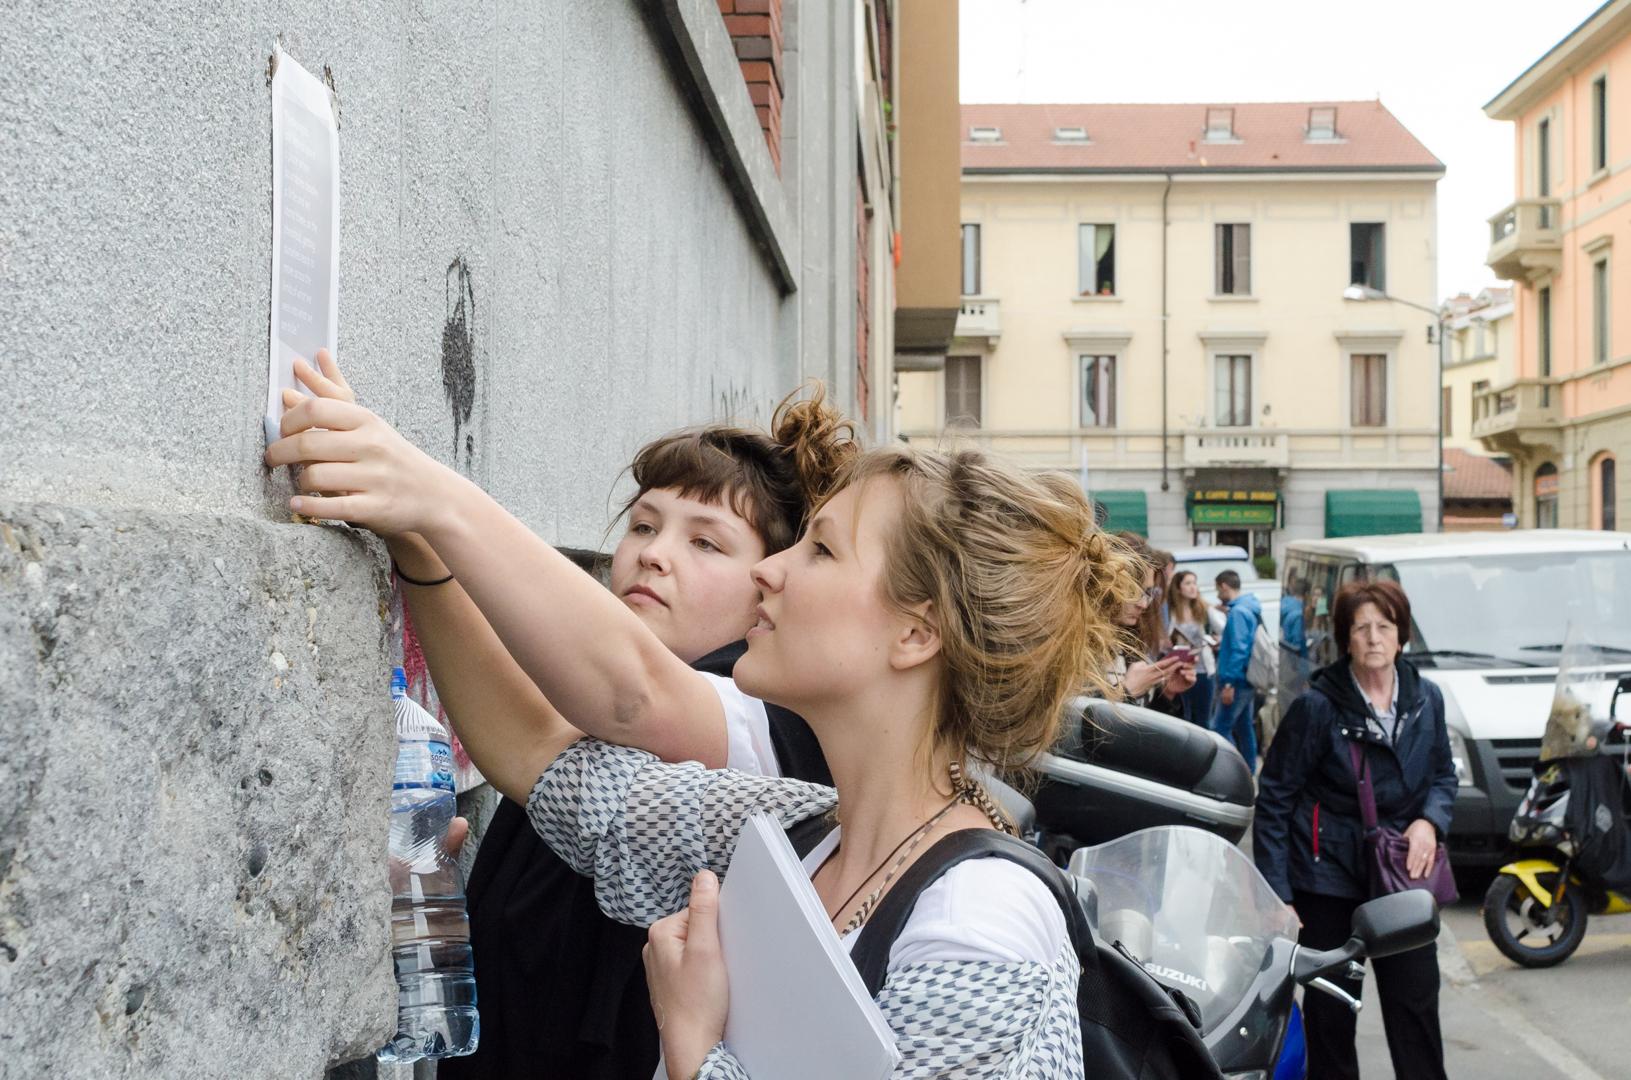 Milano2015-327.jpg